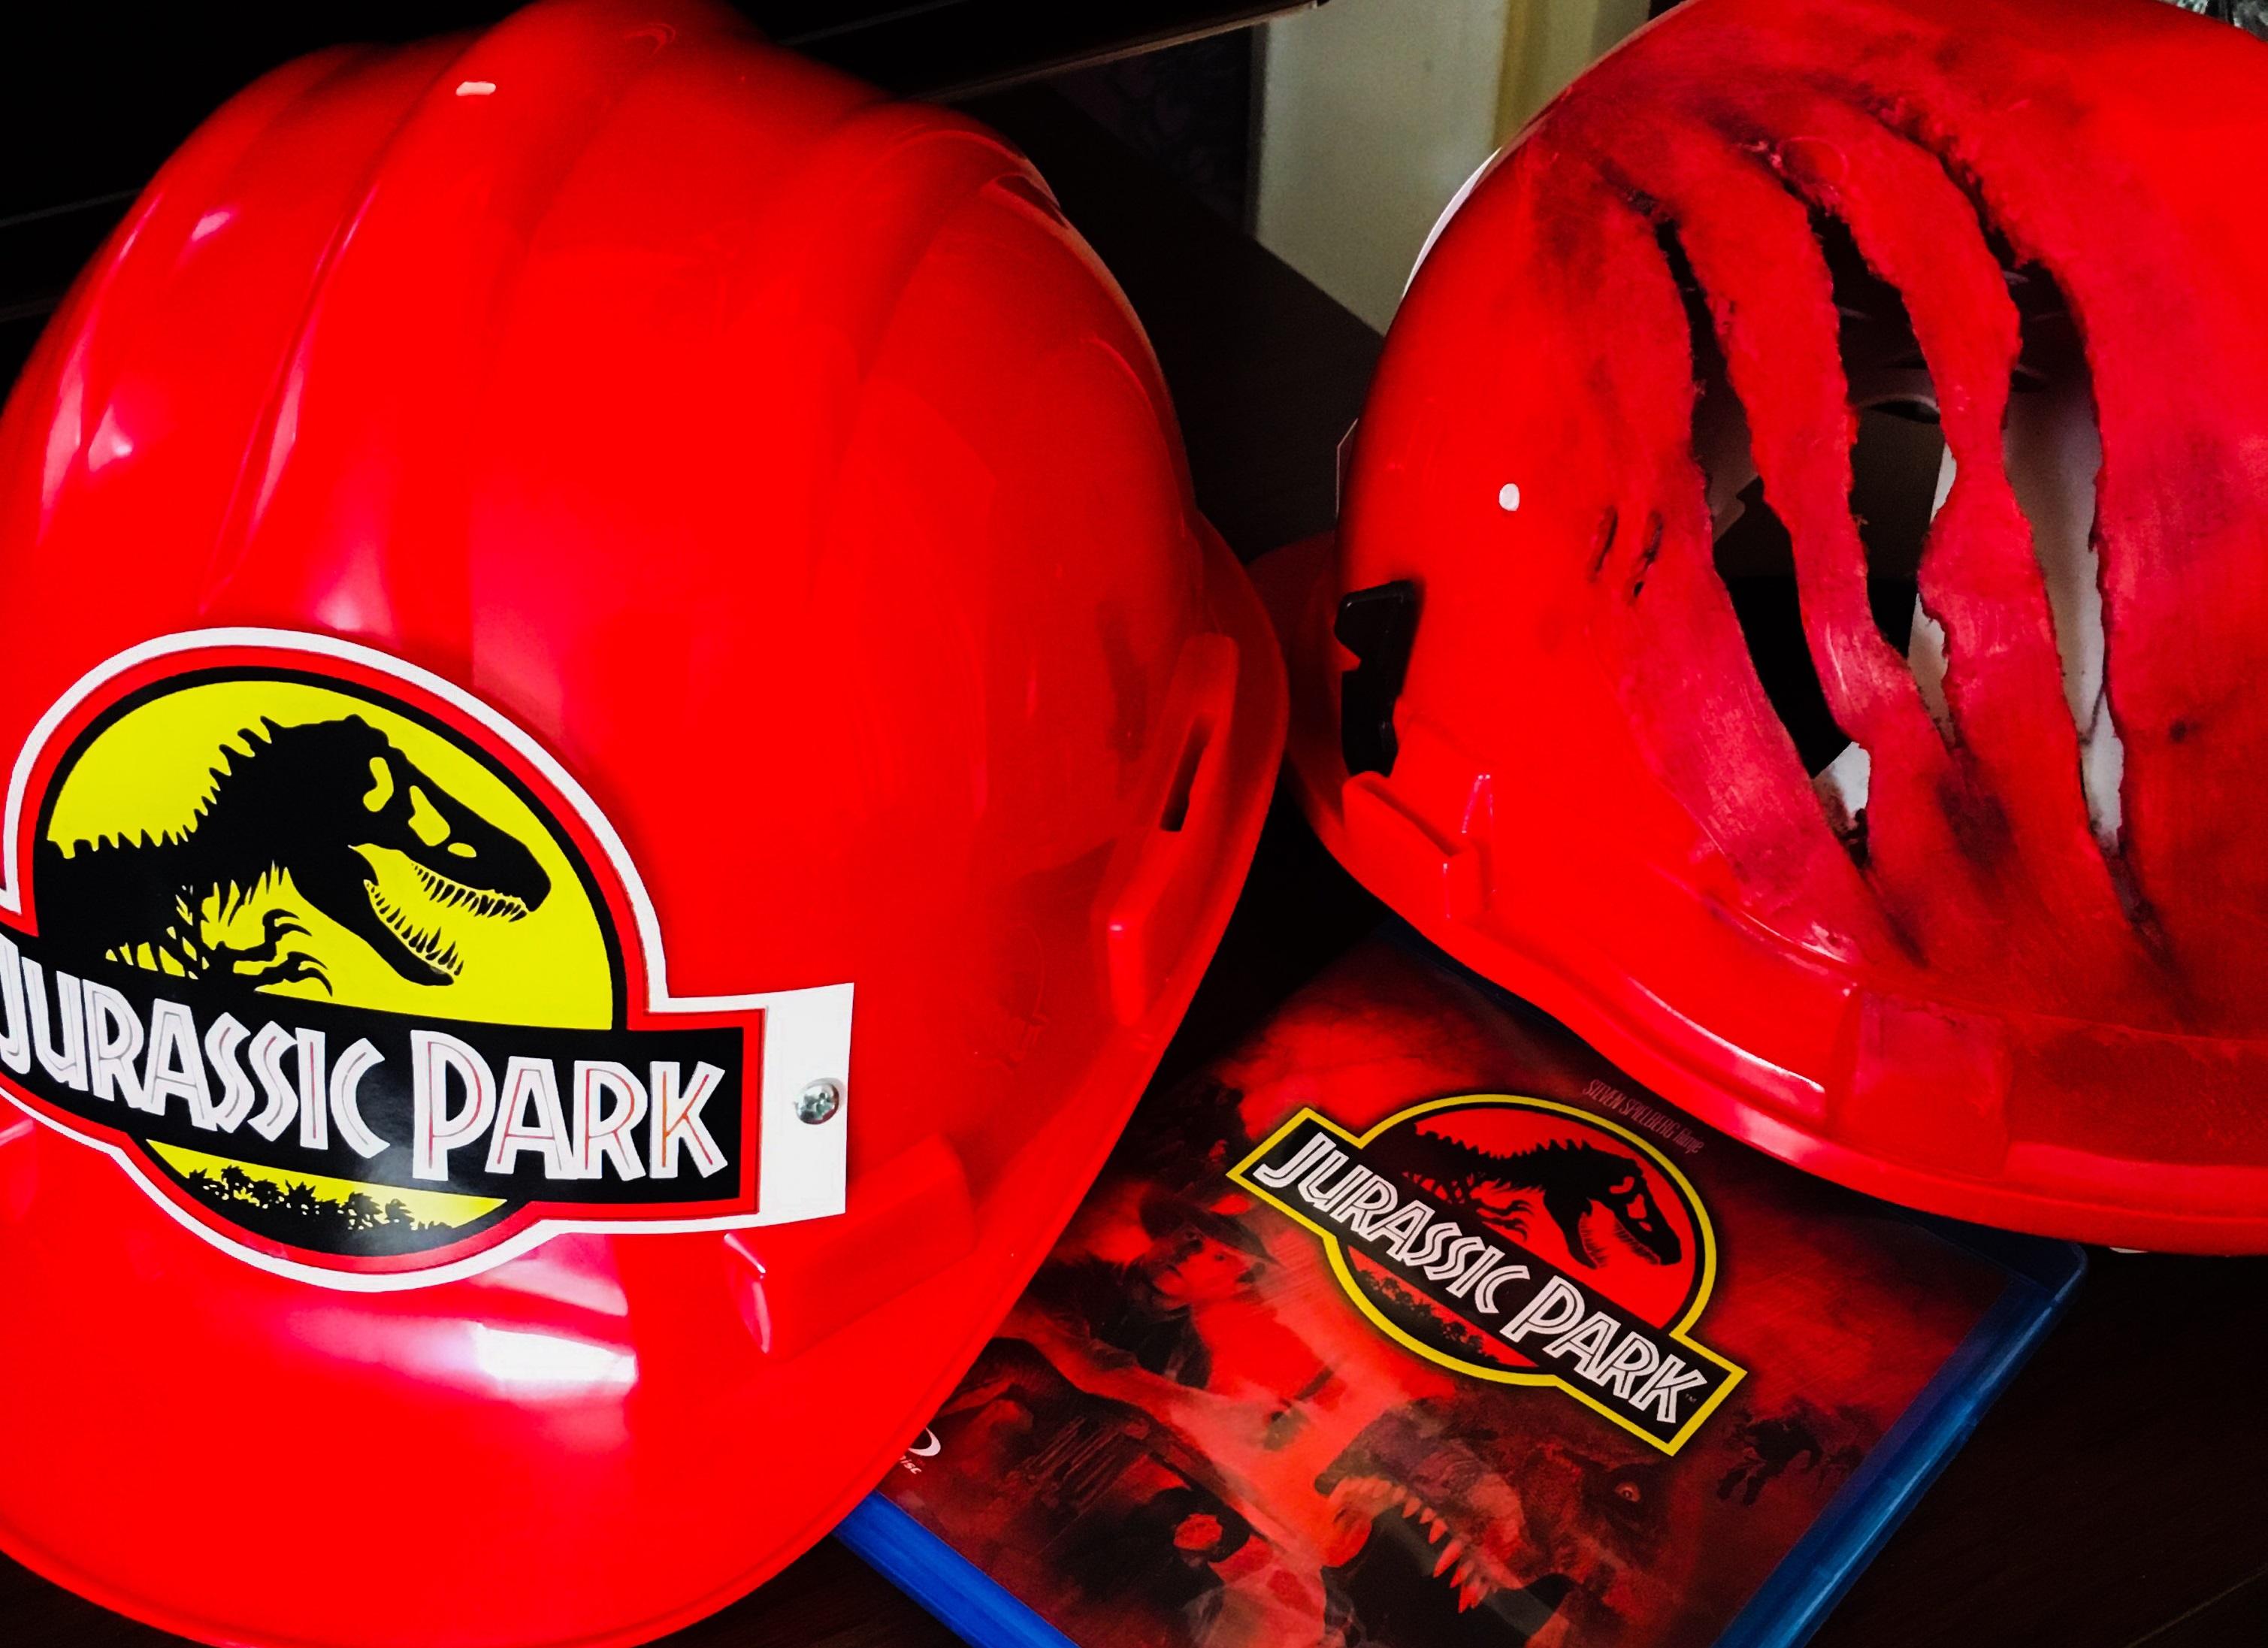 szmk_diy_jurassic_park_helmet_jurassic_world_sisa.jpg